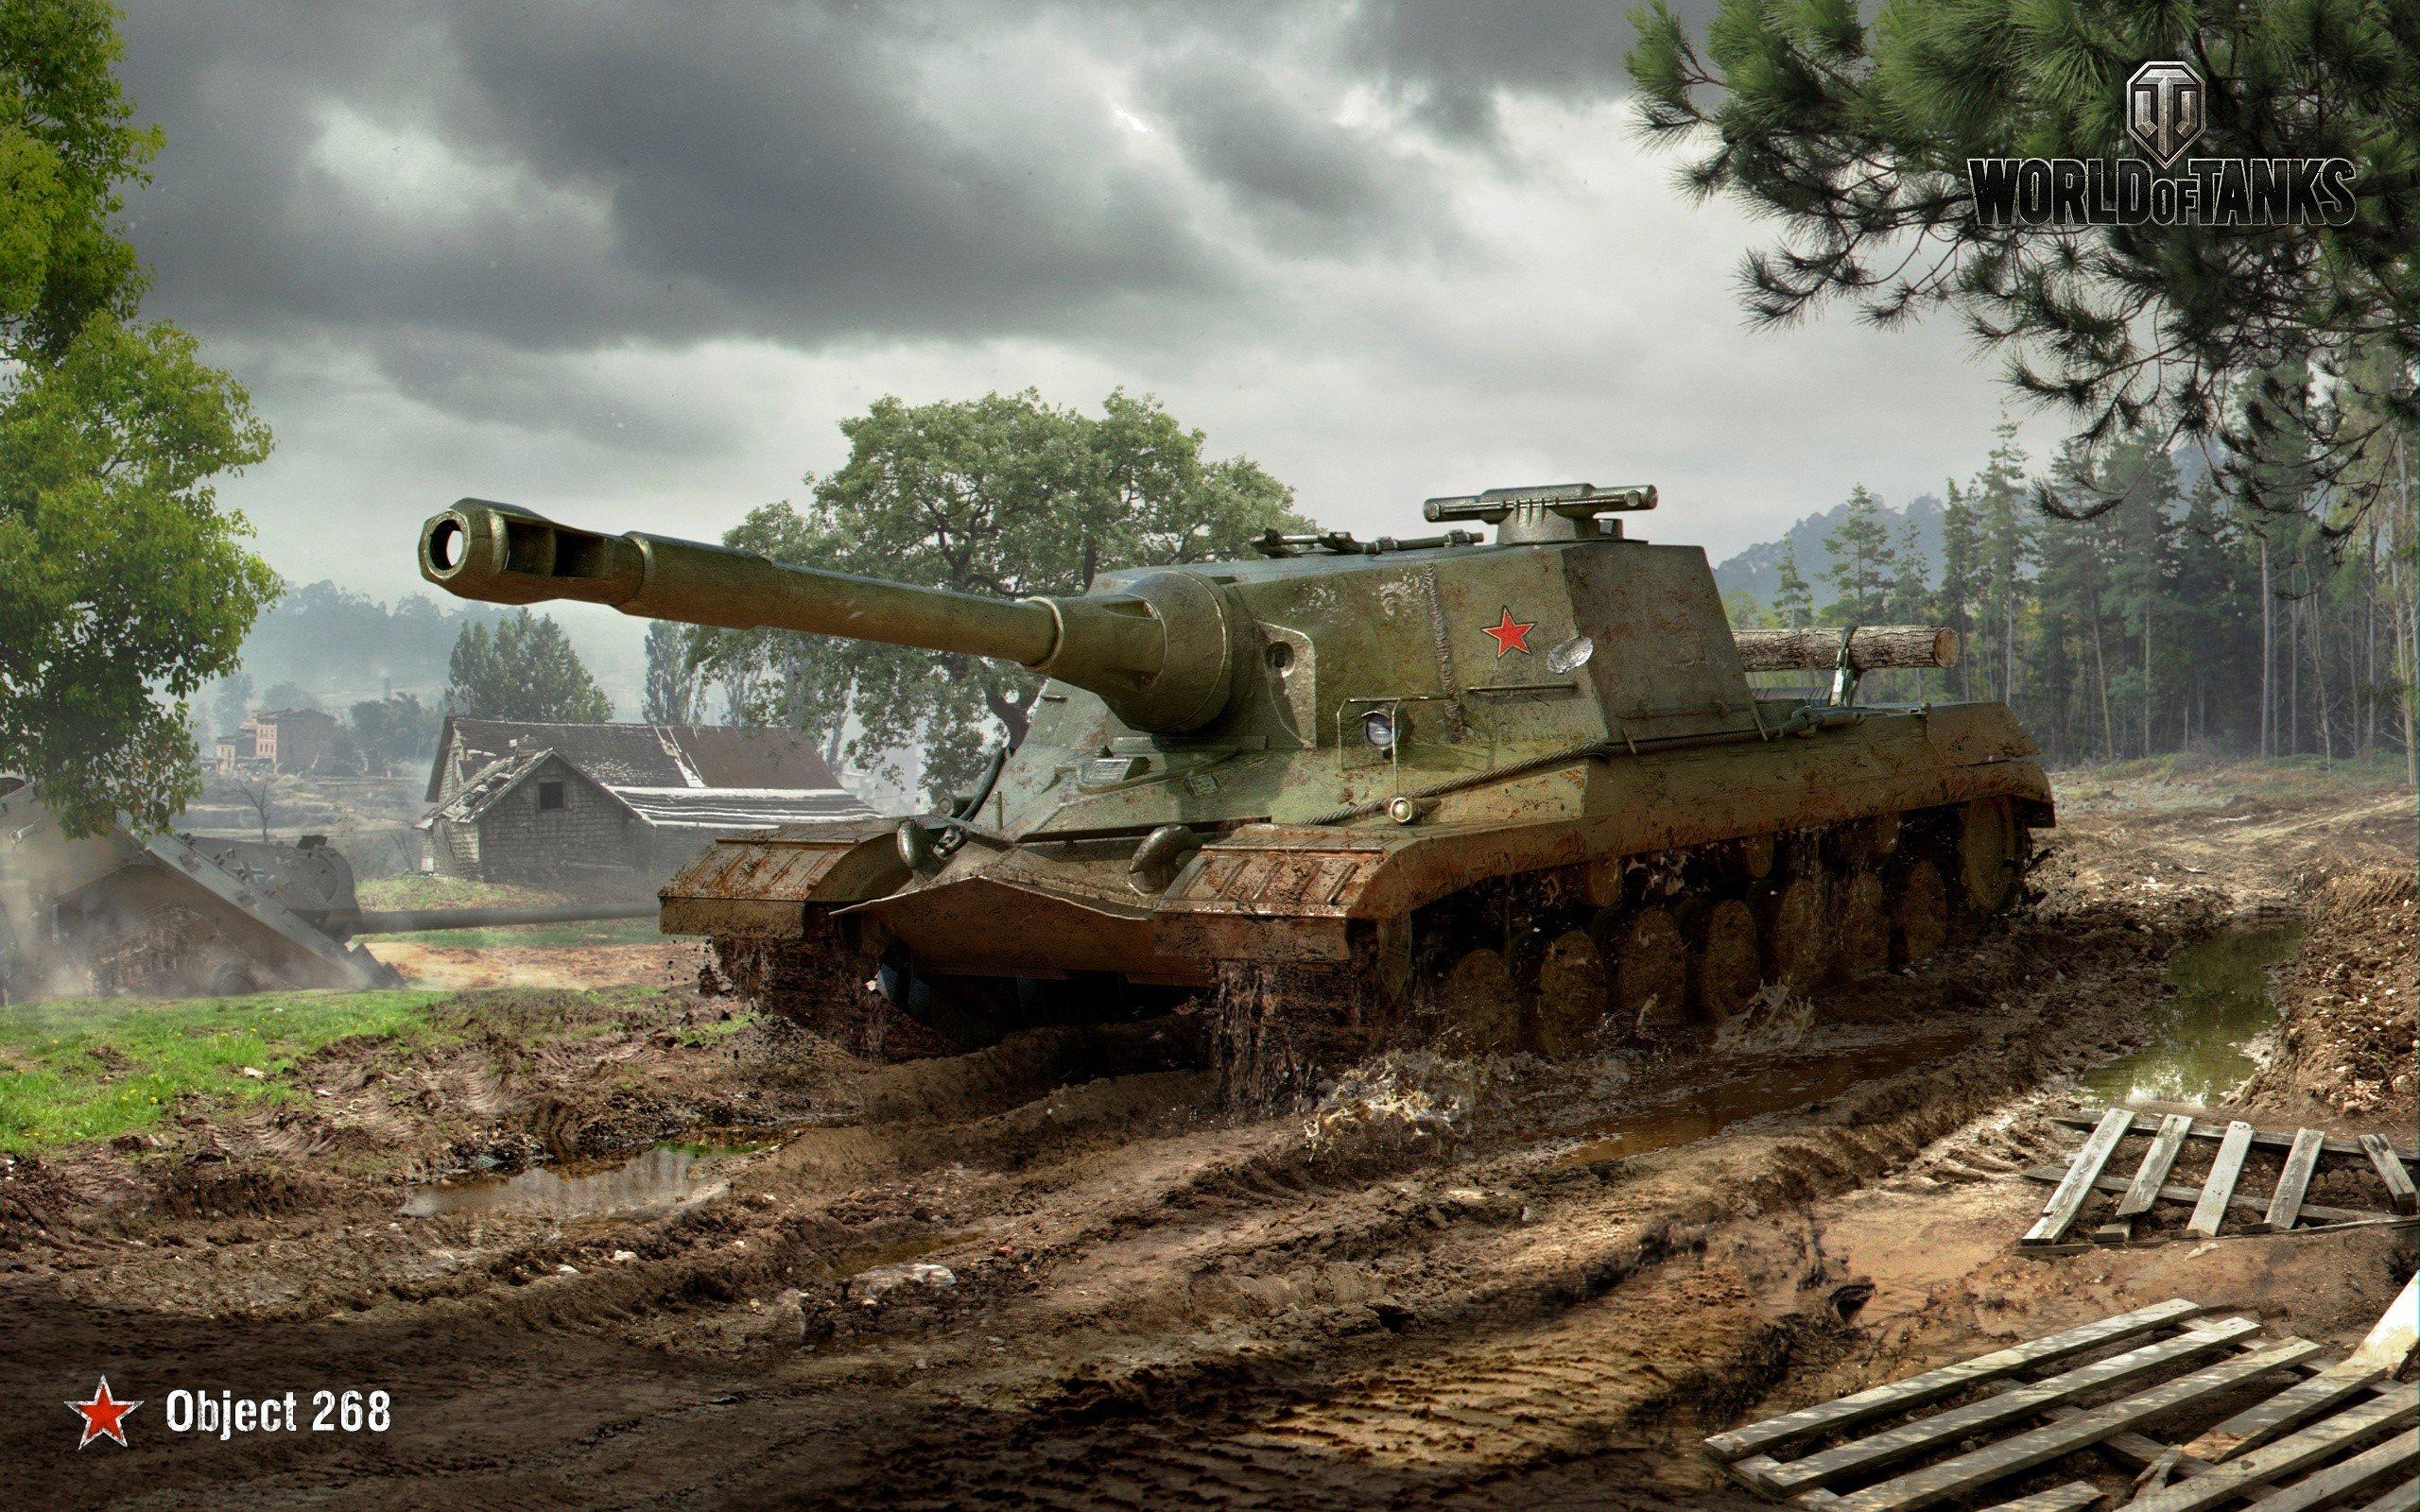 Wallpaper Object 268 of World Of Tanks